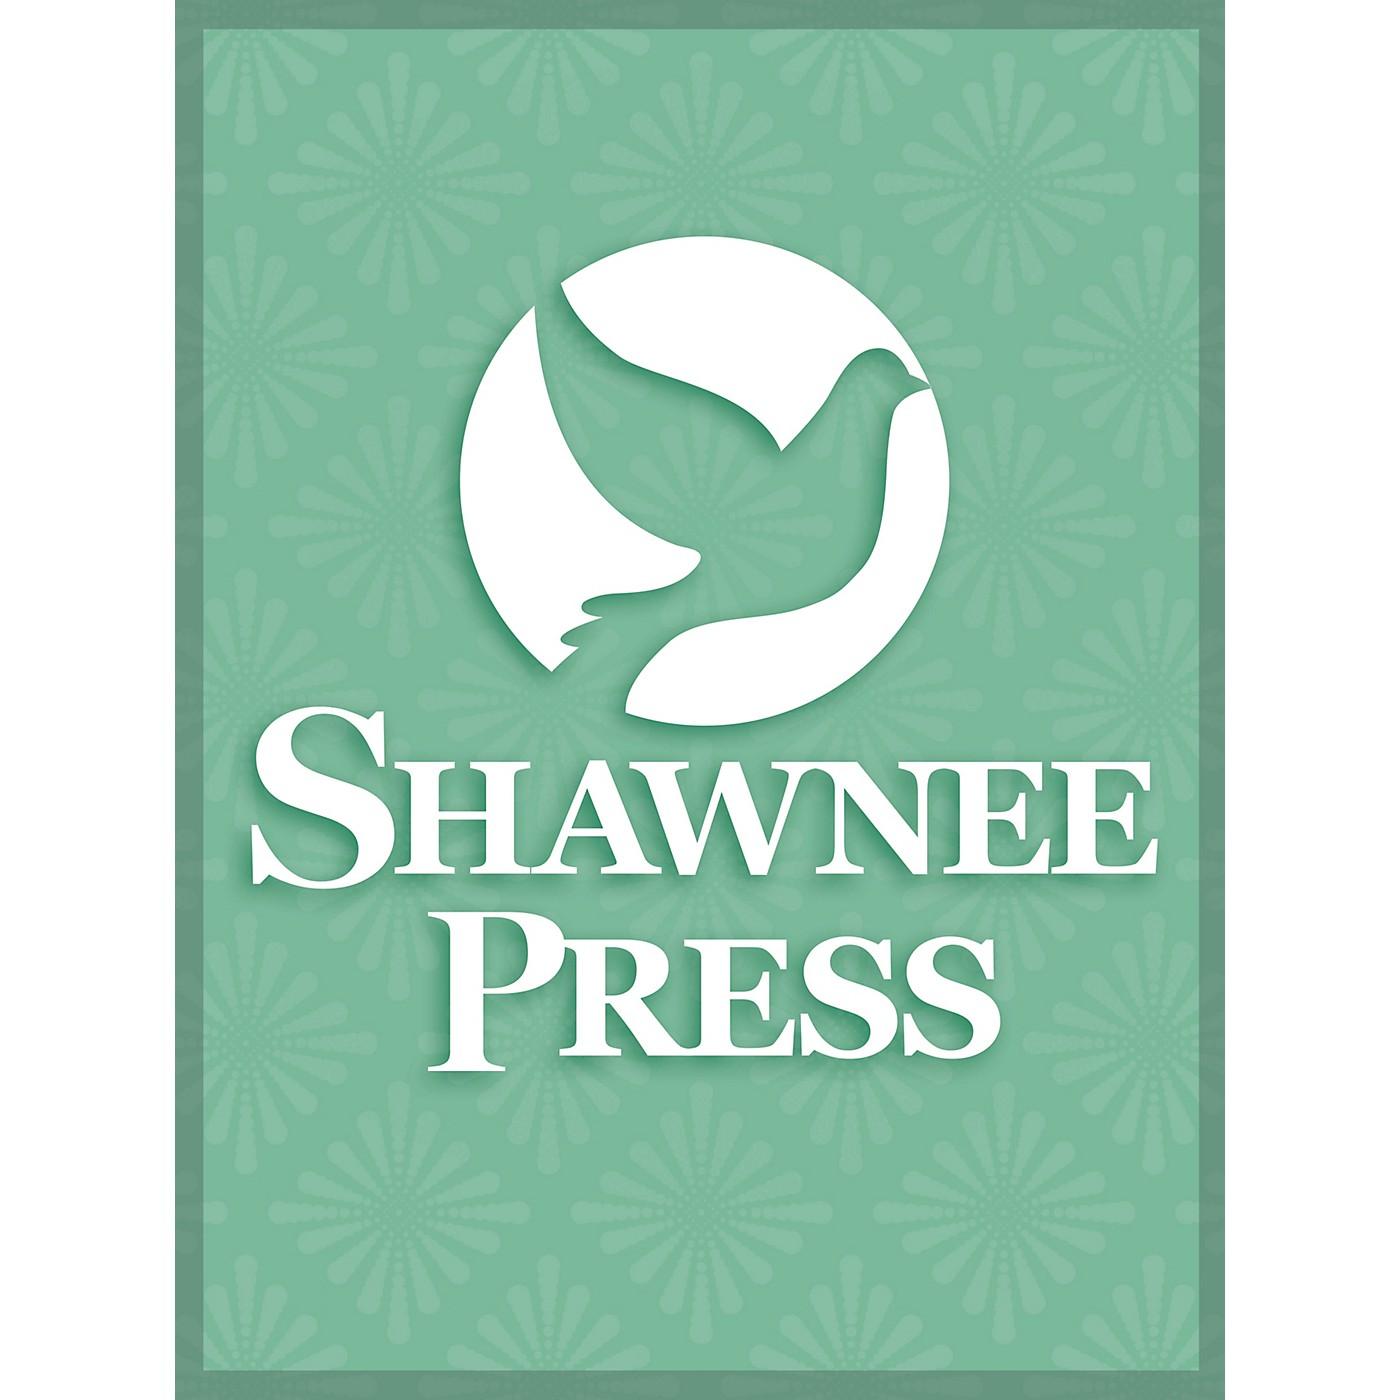 Shawnee Press Soliloquy for Bells (3-5 Octaves of Handbells) Composed by K. Buckwalter thumbnail